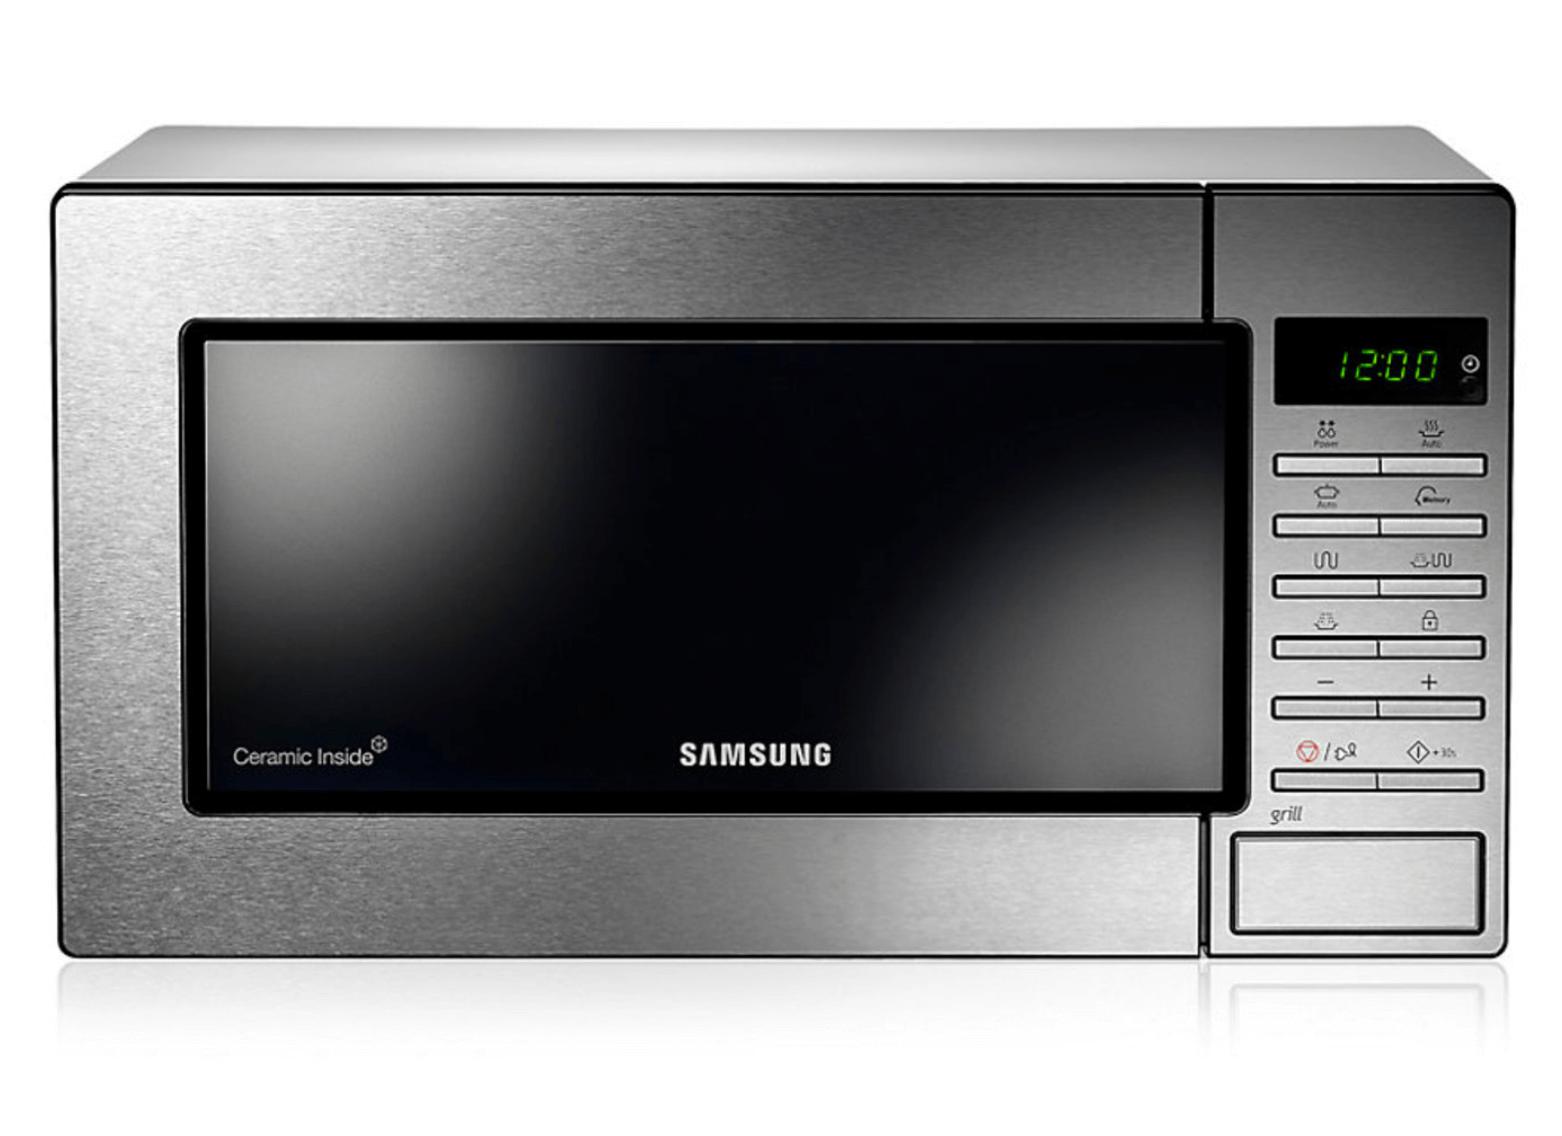 samsung mikroovn - Testvinder – Samsung GE87MC - samsung mikrobølgeovn